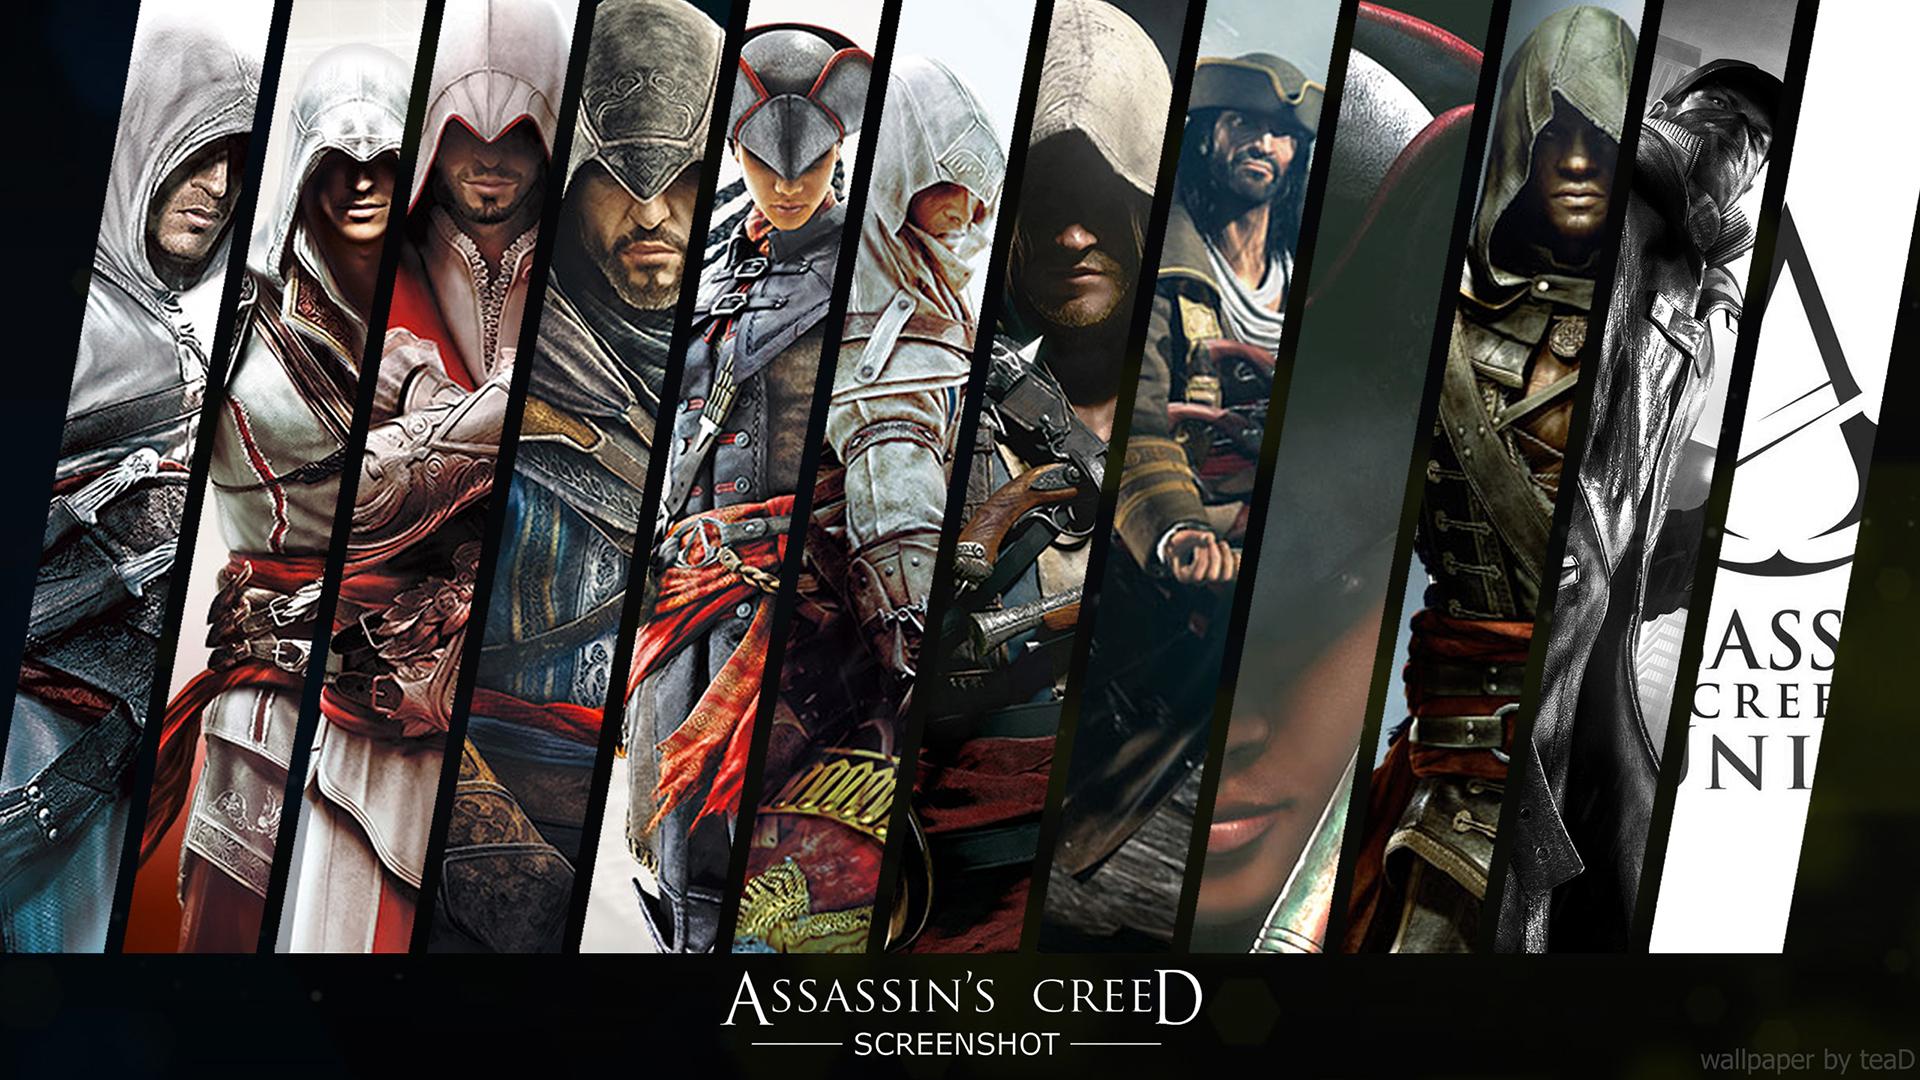 Assassins Creed Screenshot Promo Wallpaper By Santap555 On Deviantart